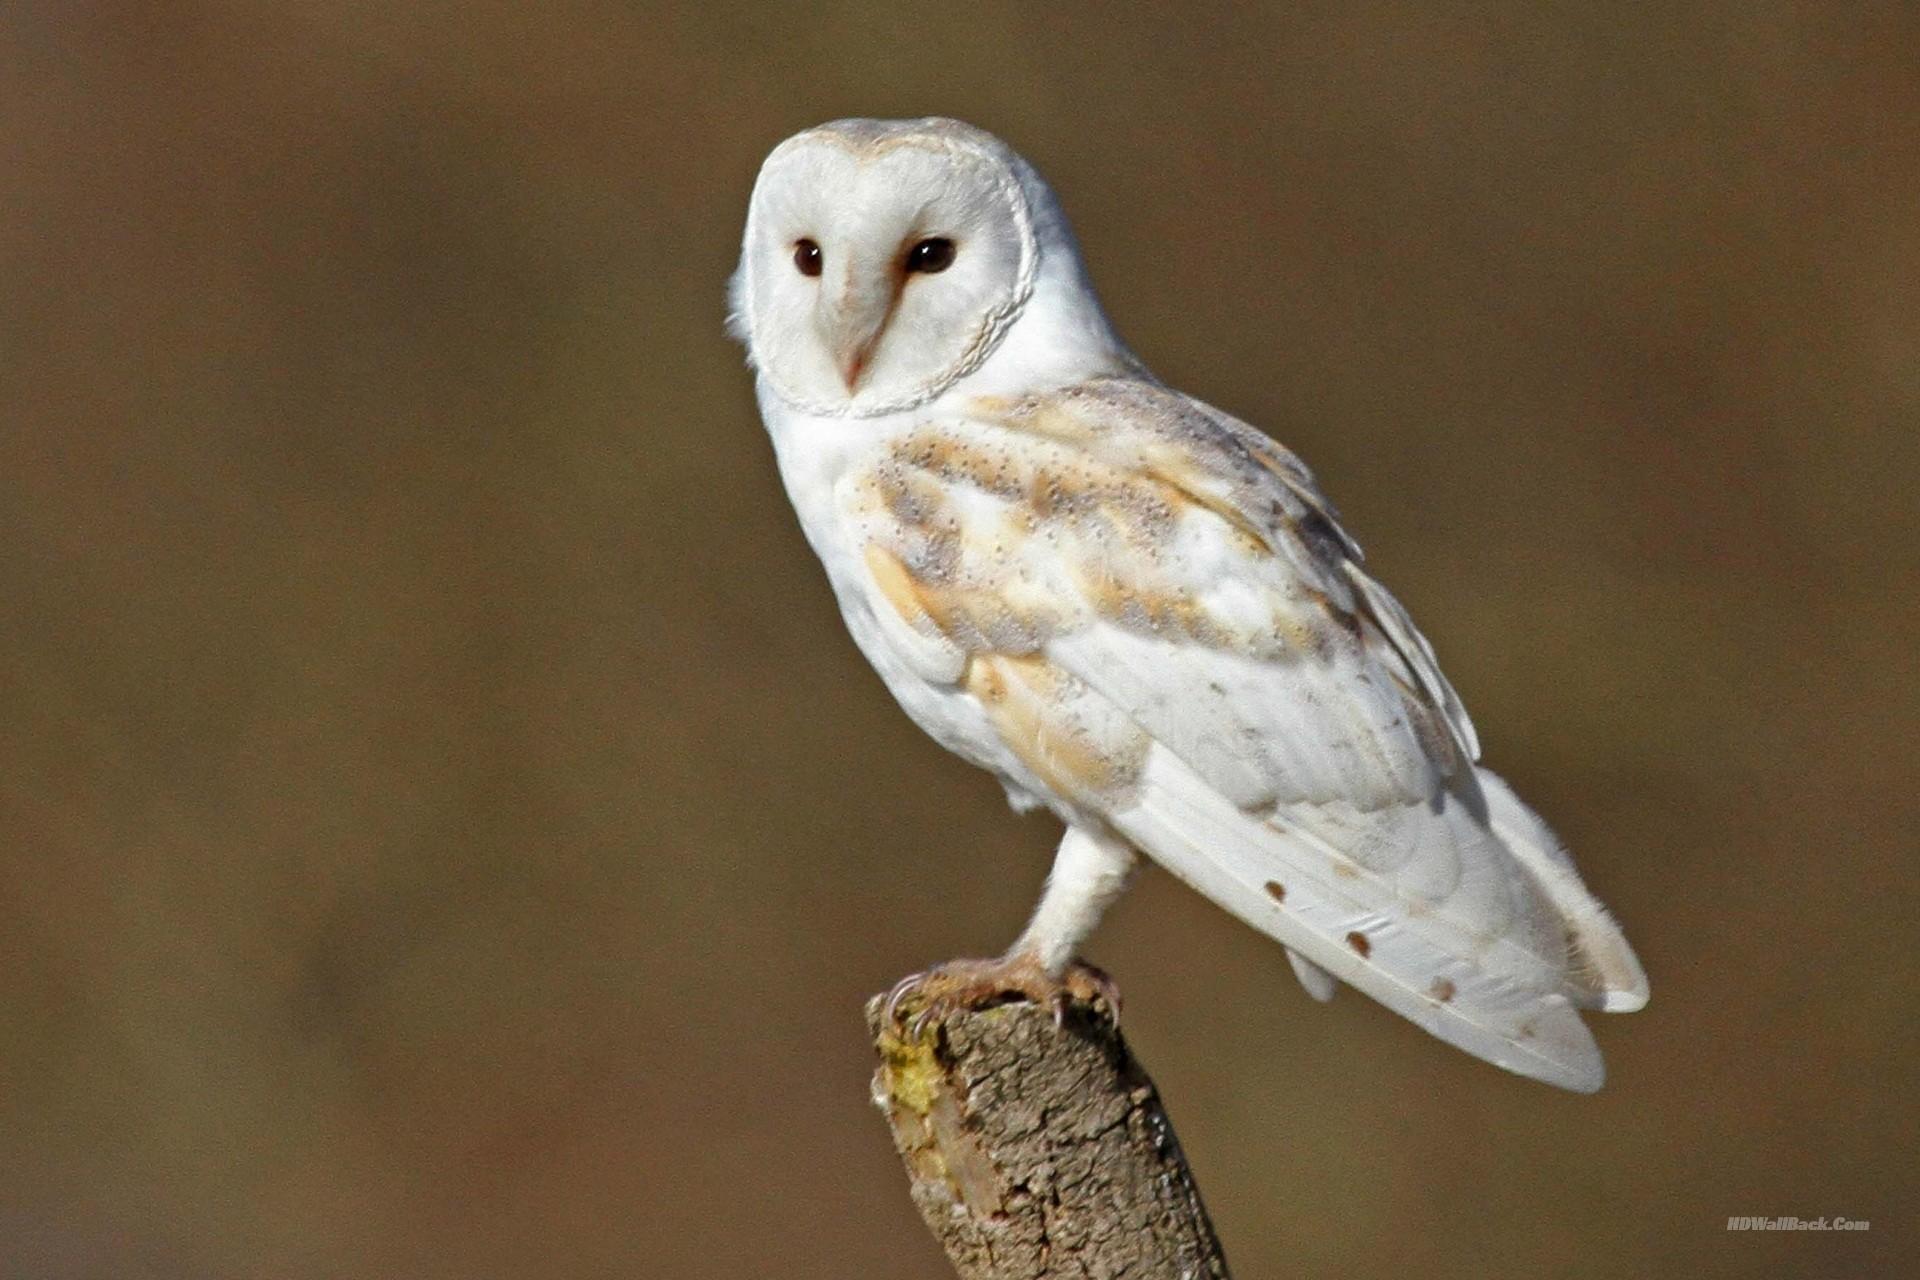 White Barn Owl Wallpaper. Â«Â«